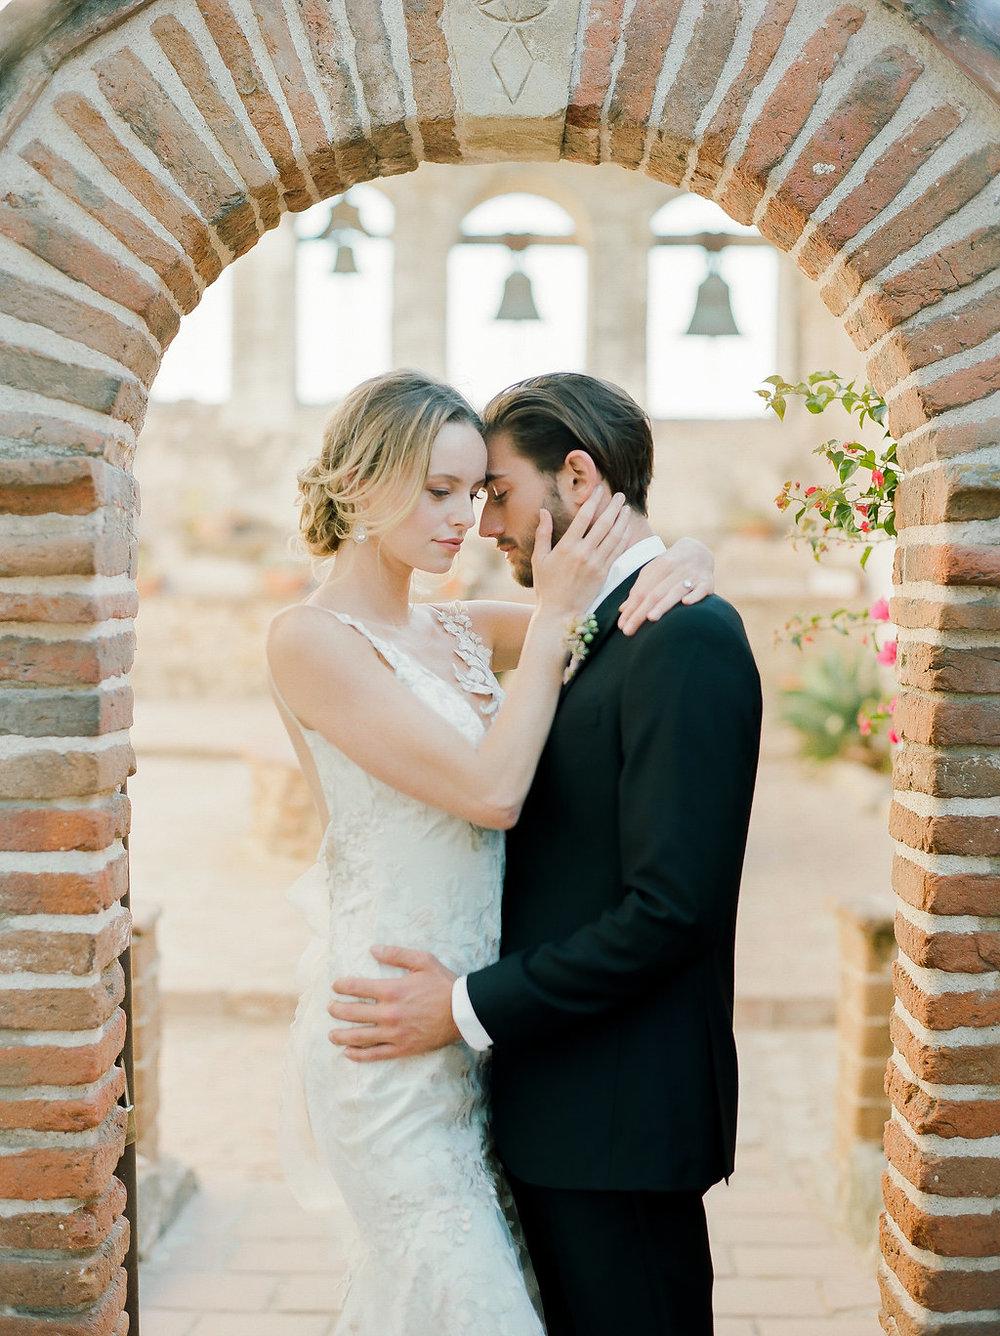 Spanish Mission Style Wedding Ideas Summer Flowers Finding Flora San Juan Capistrano European Venues California Bride and Groom Wedding Bells Bridals